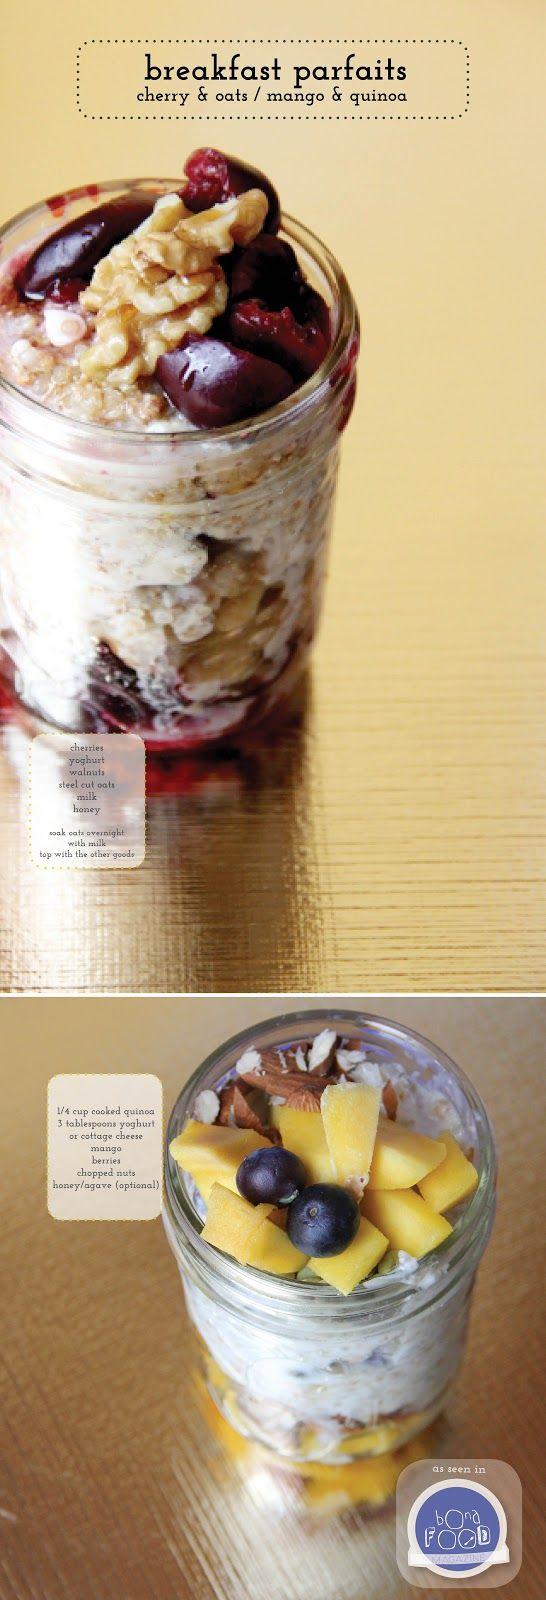 Breakfast parfaits - two ways...Cherries & oats or Mango & Quinoa